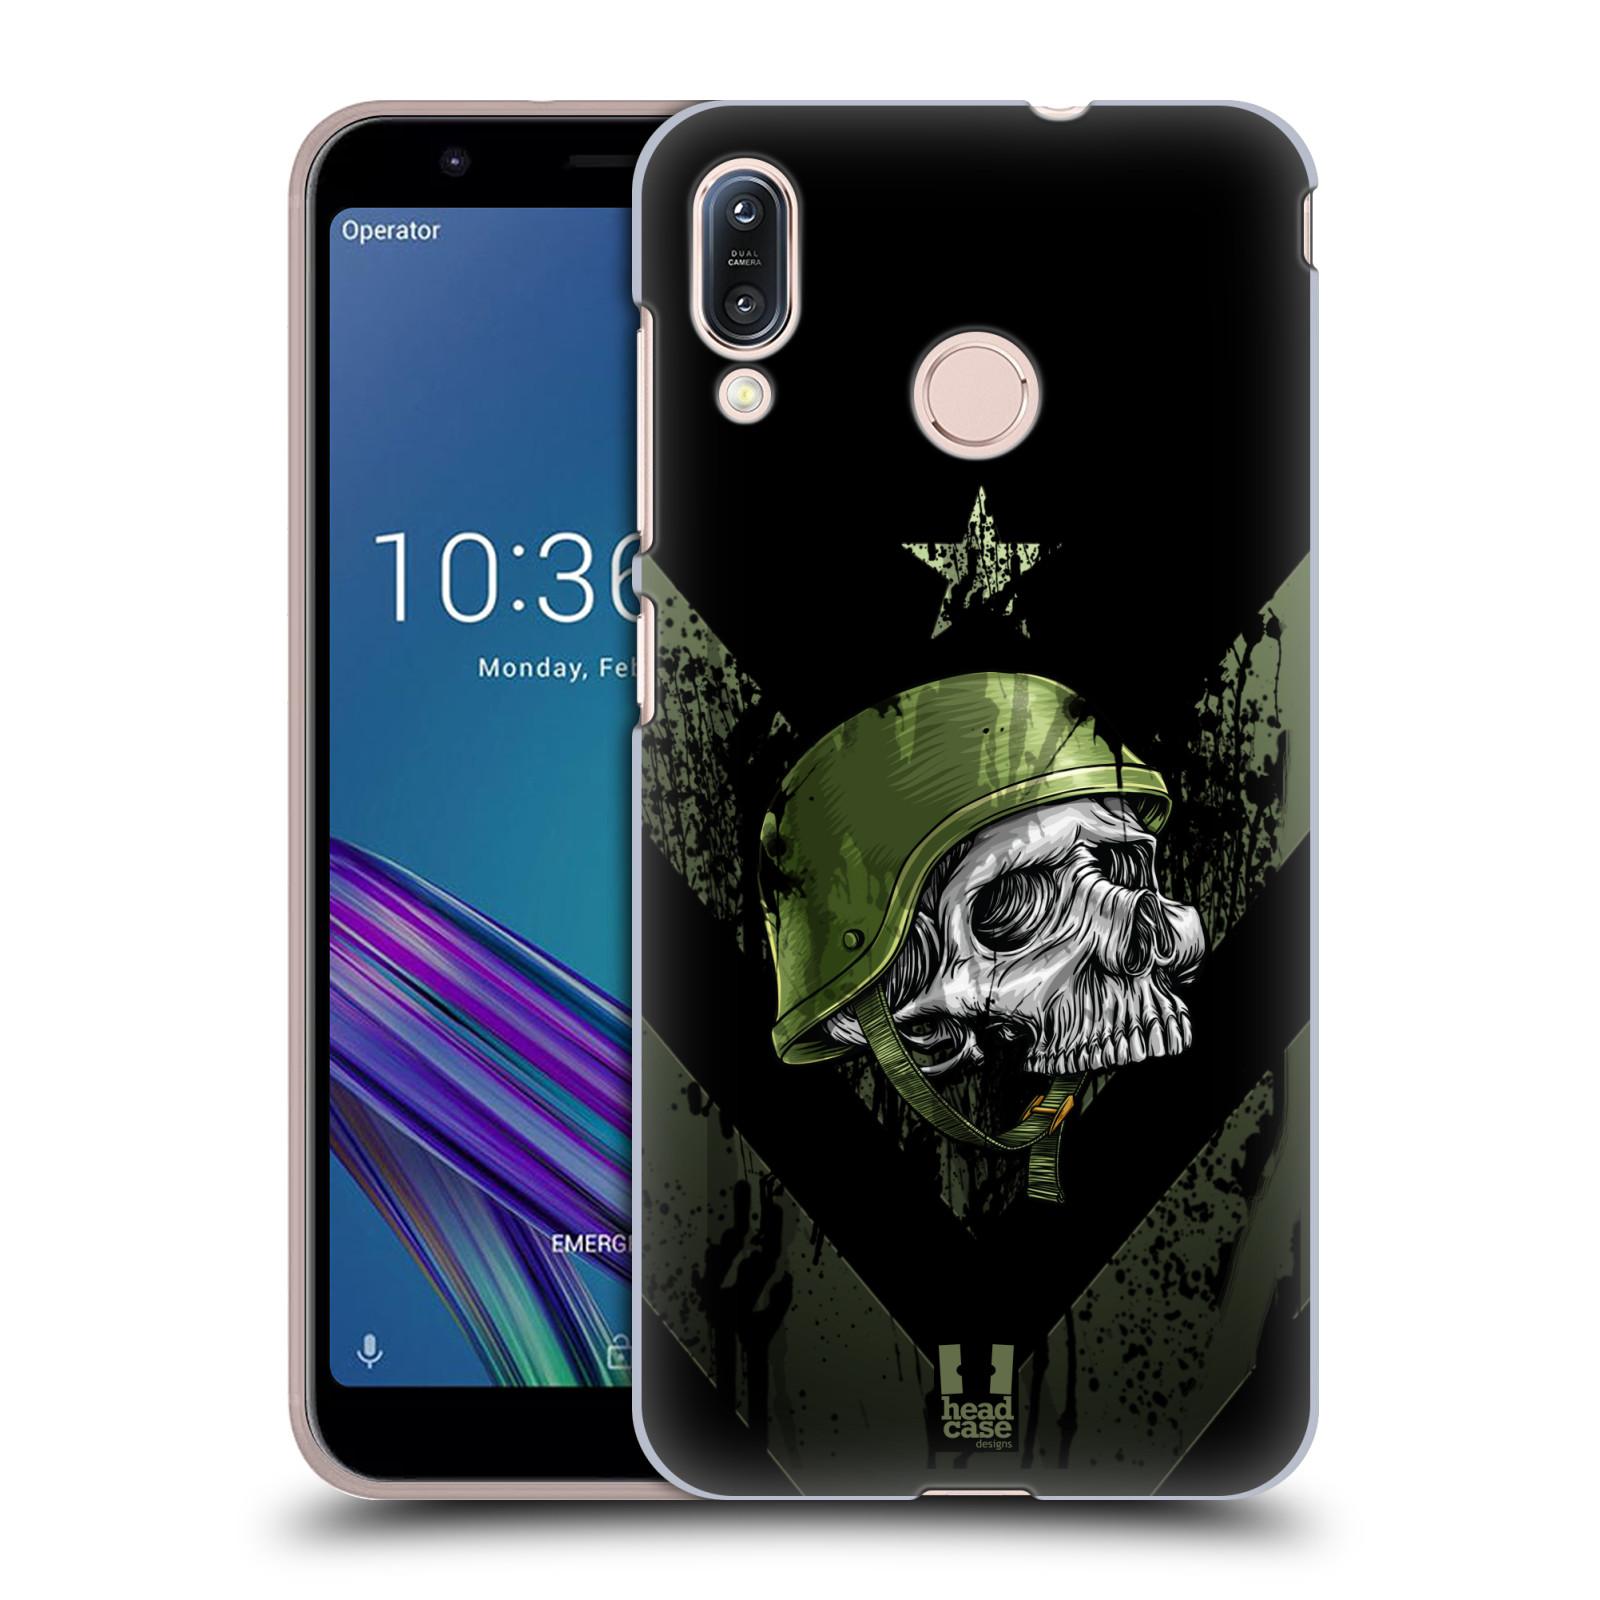 Plastové pouzdro na mobil Asus Zenfone Max M1 ZB555KL - Head Case - LEBKA ONE MAN